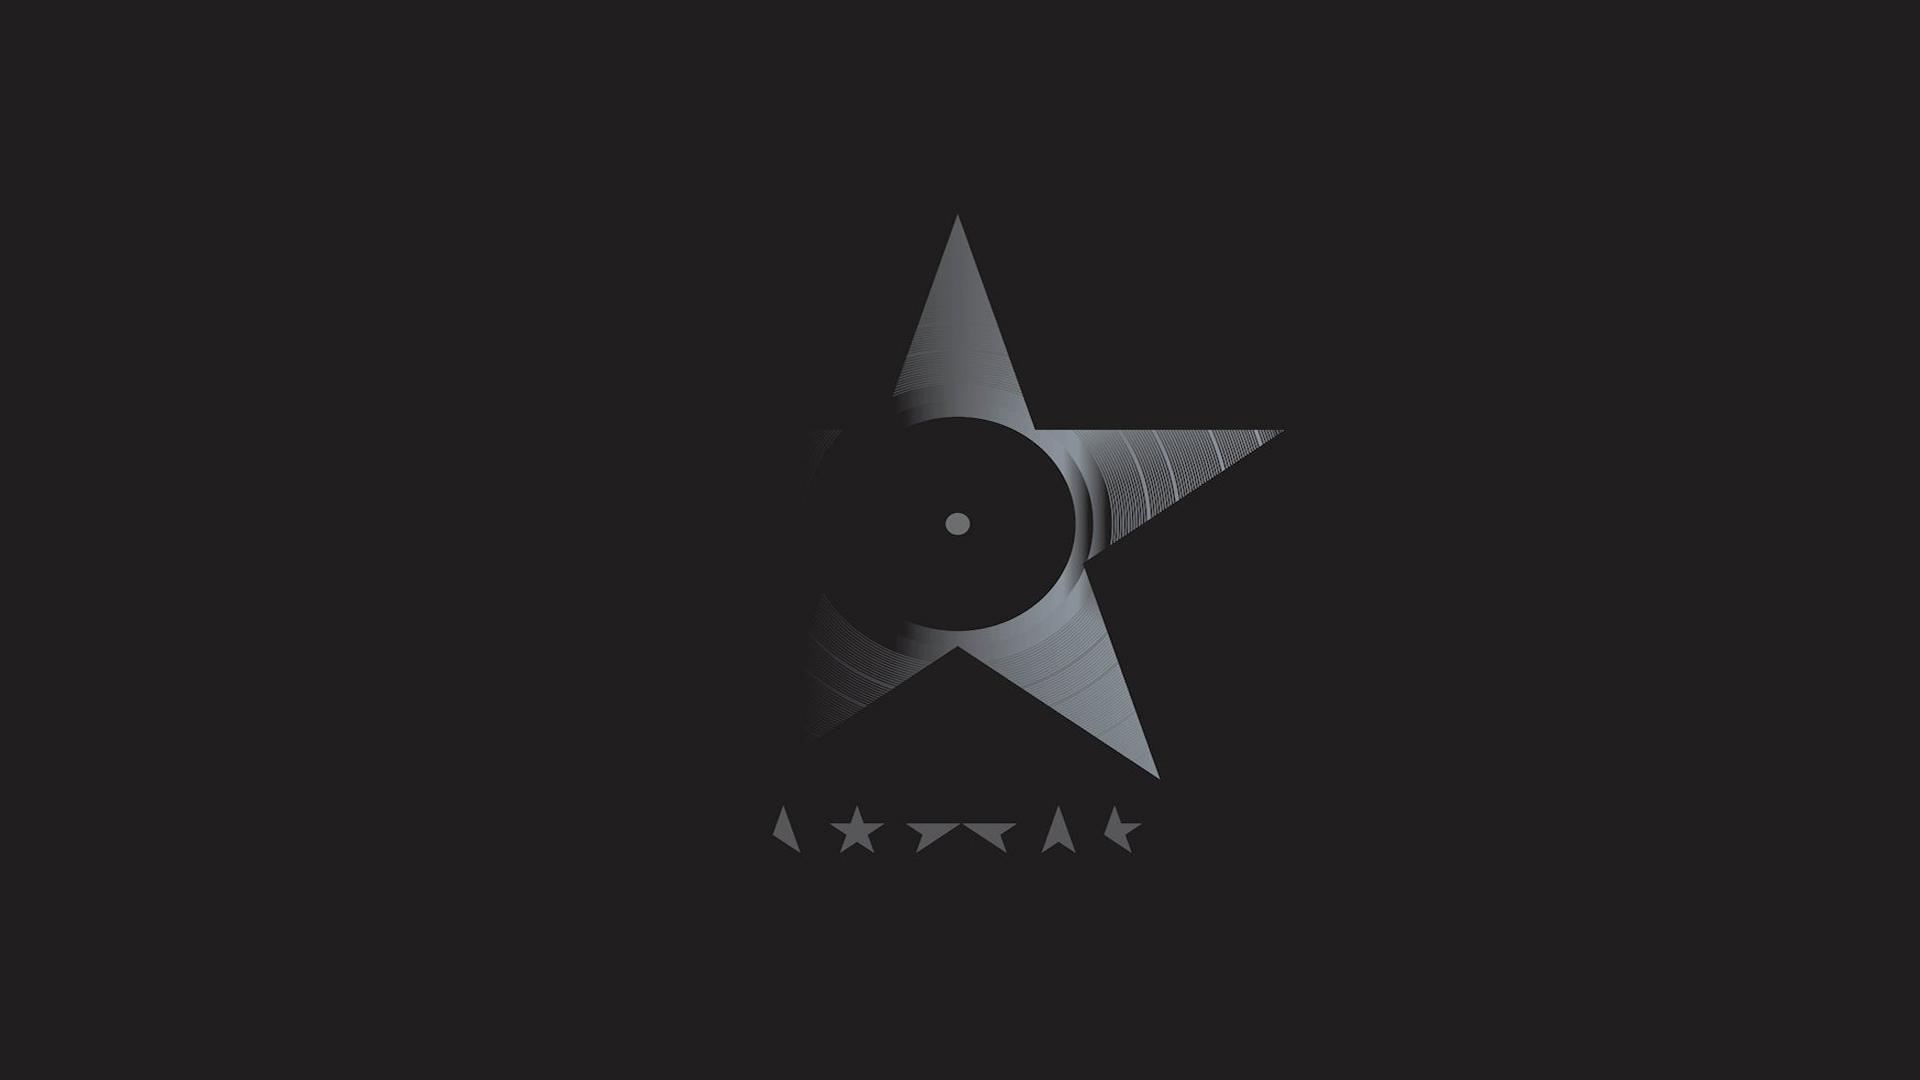 black star wallpaper  Black Star Wallpaper (72  images)